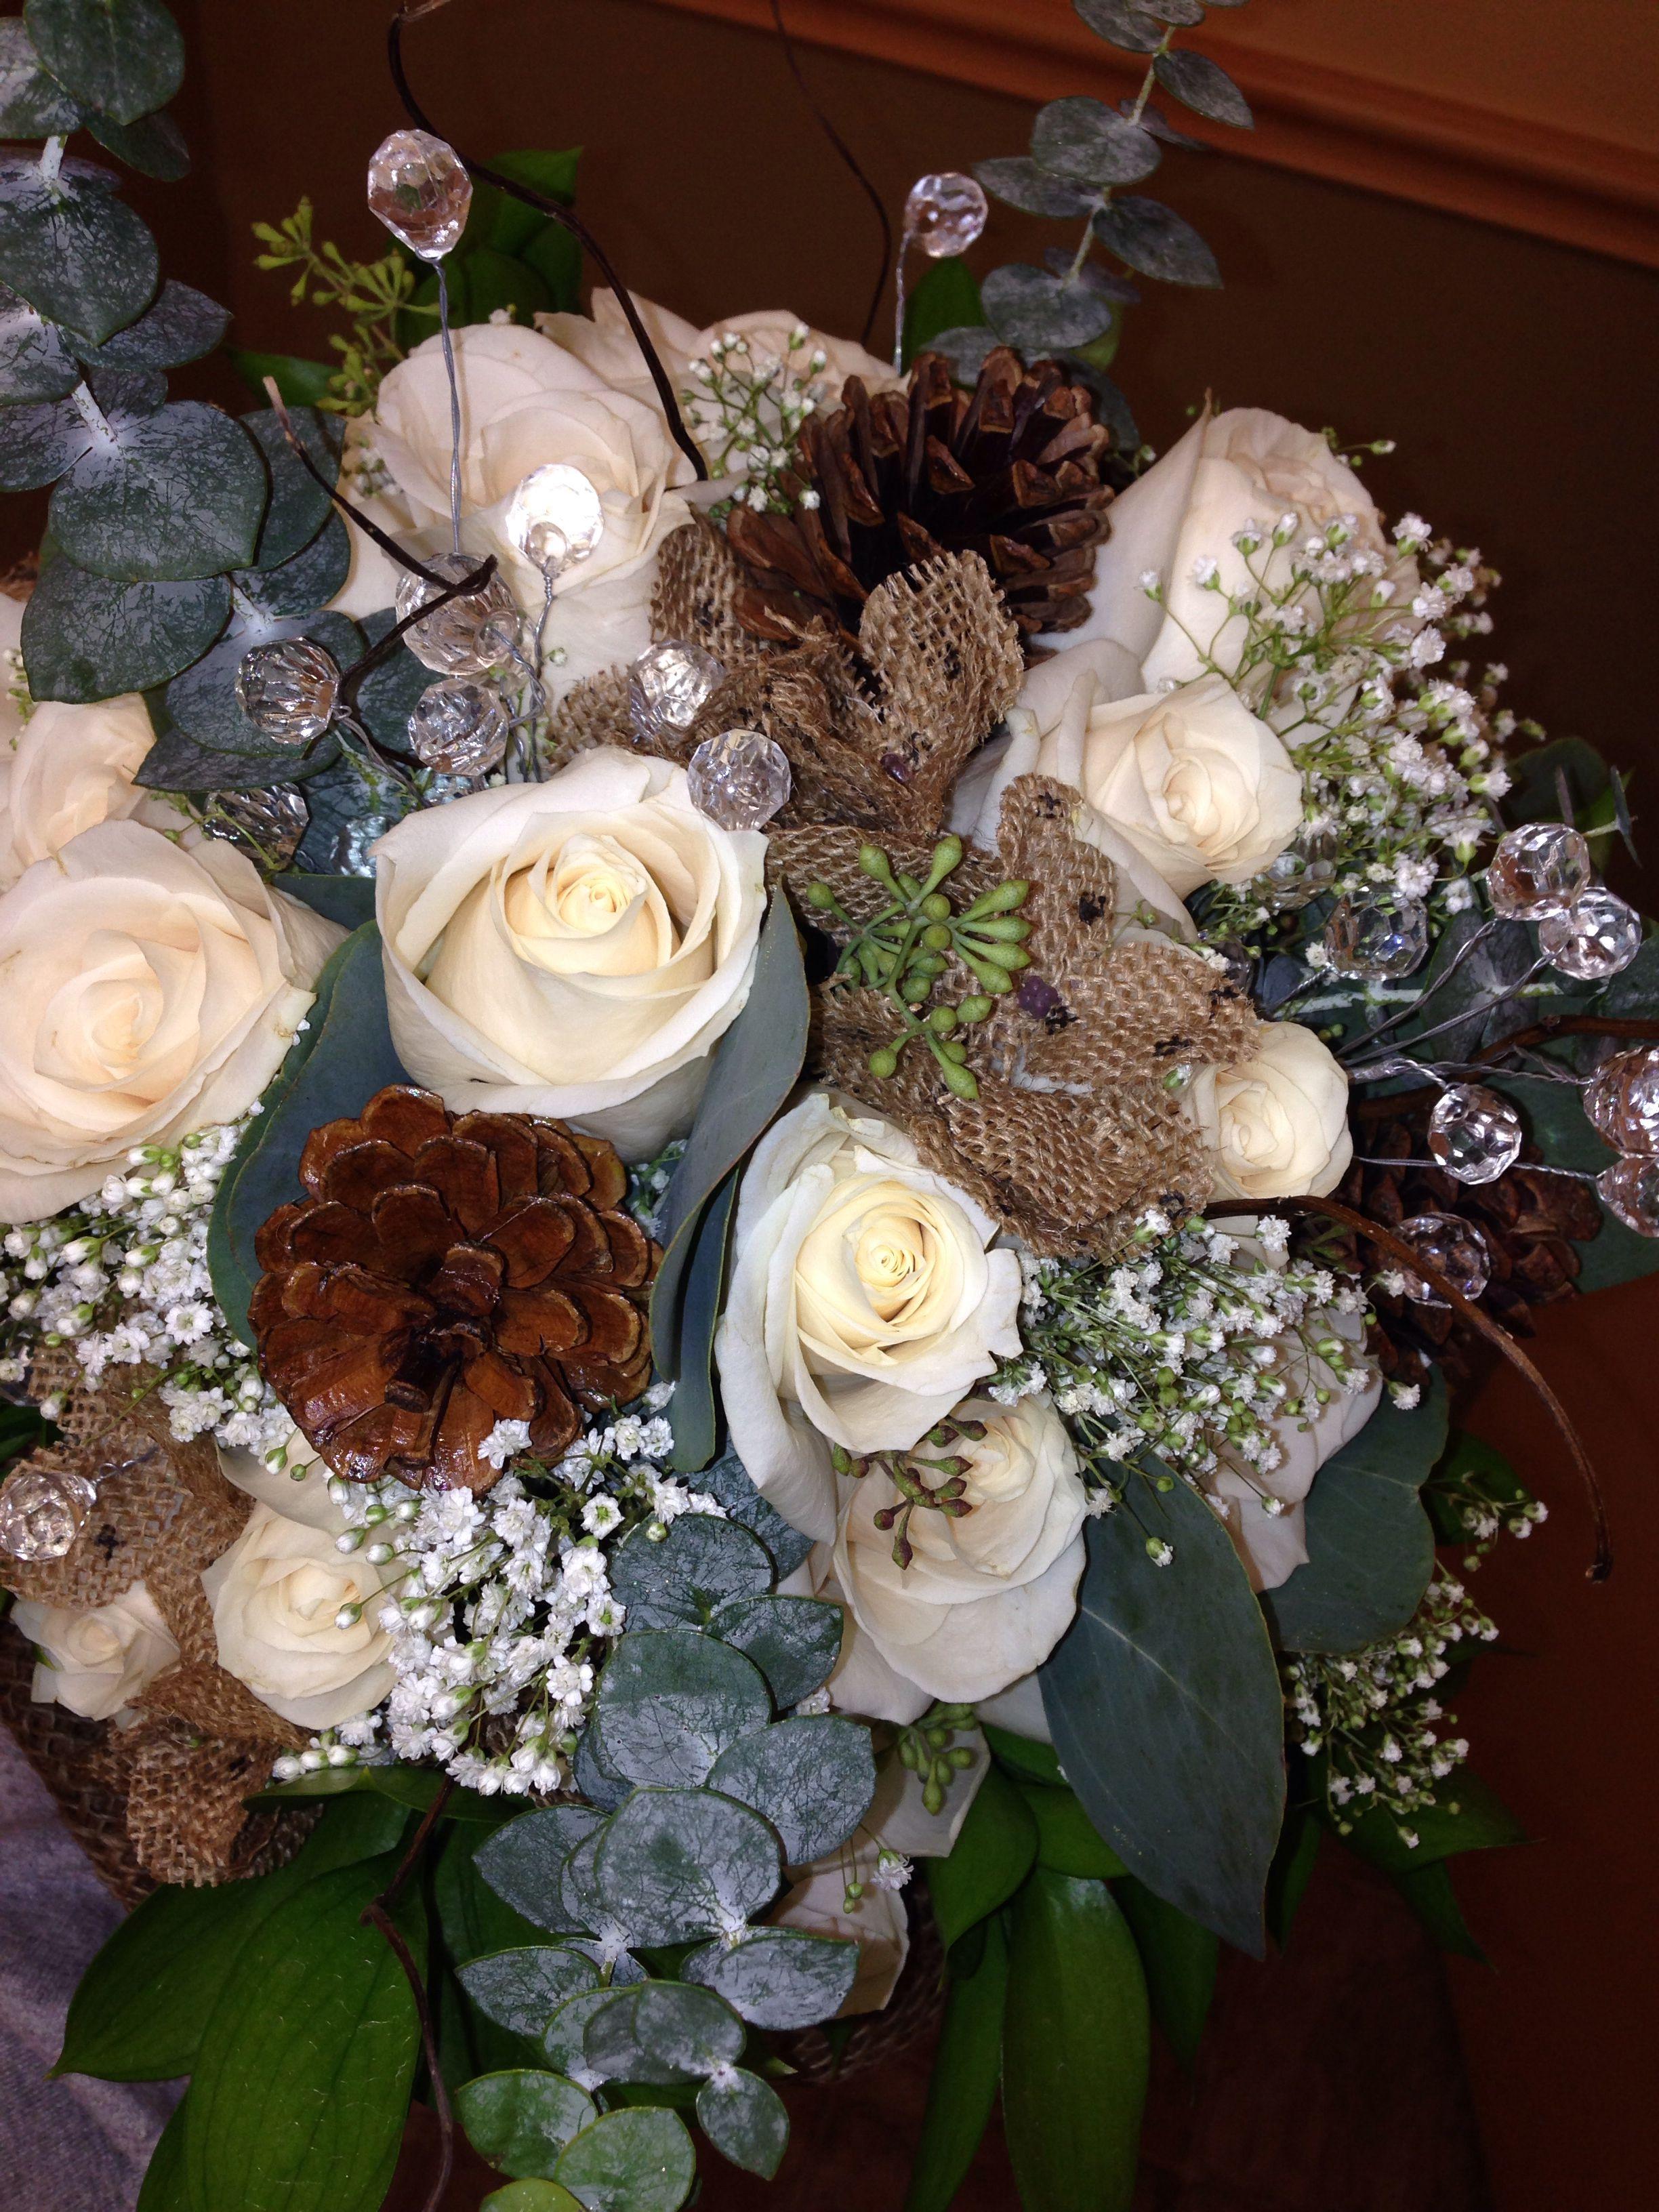 Pinecone, eucalyptus, and rose bouquet